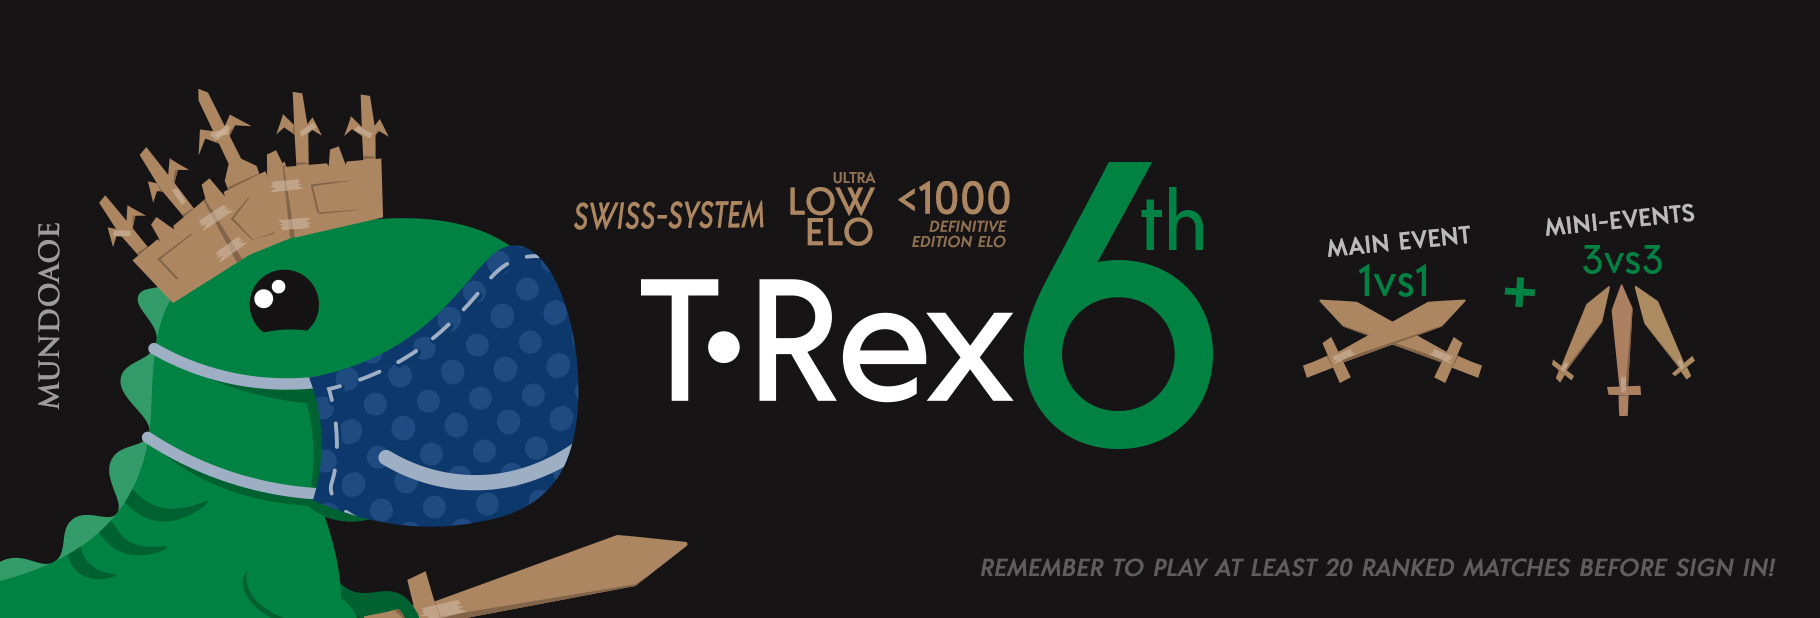 trex6-bannerAOEzone.jpg